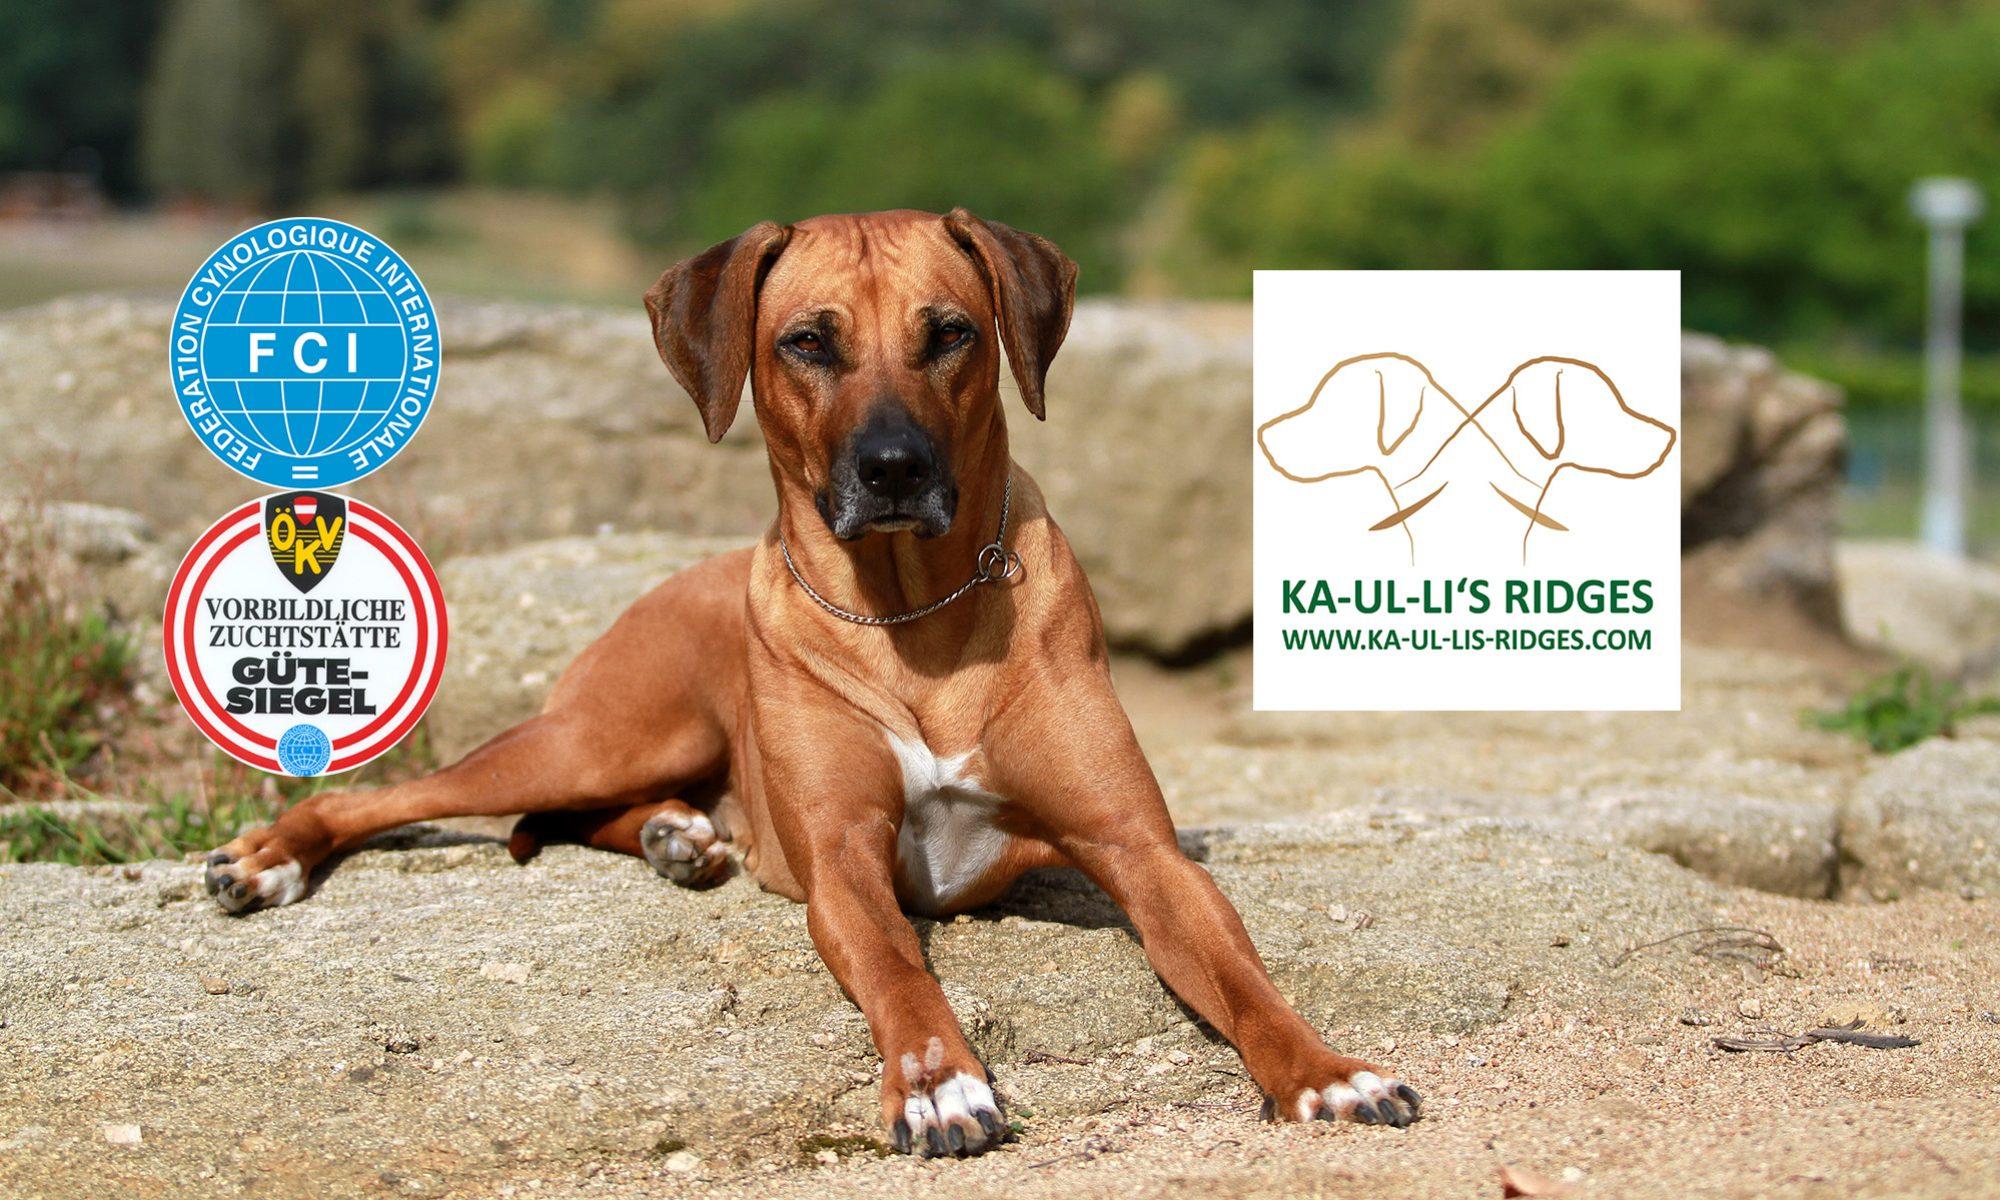 Ka-Ul-Li's Ridges